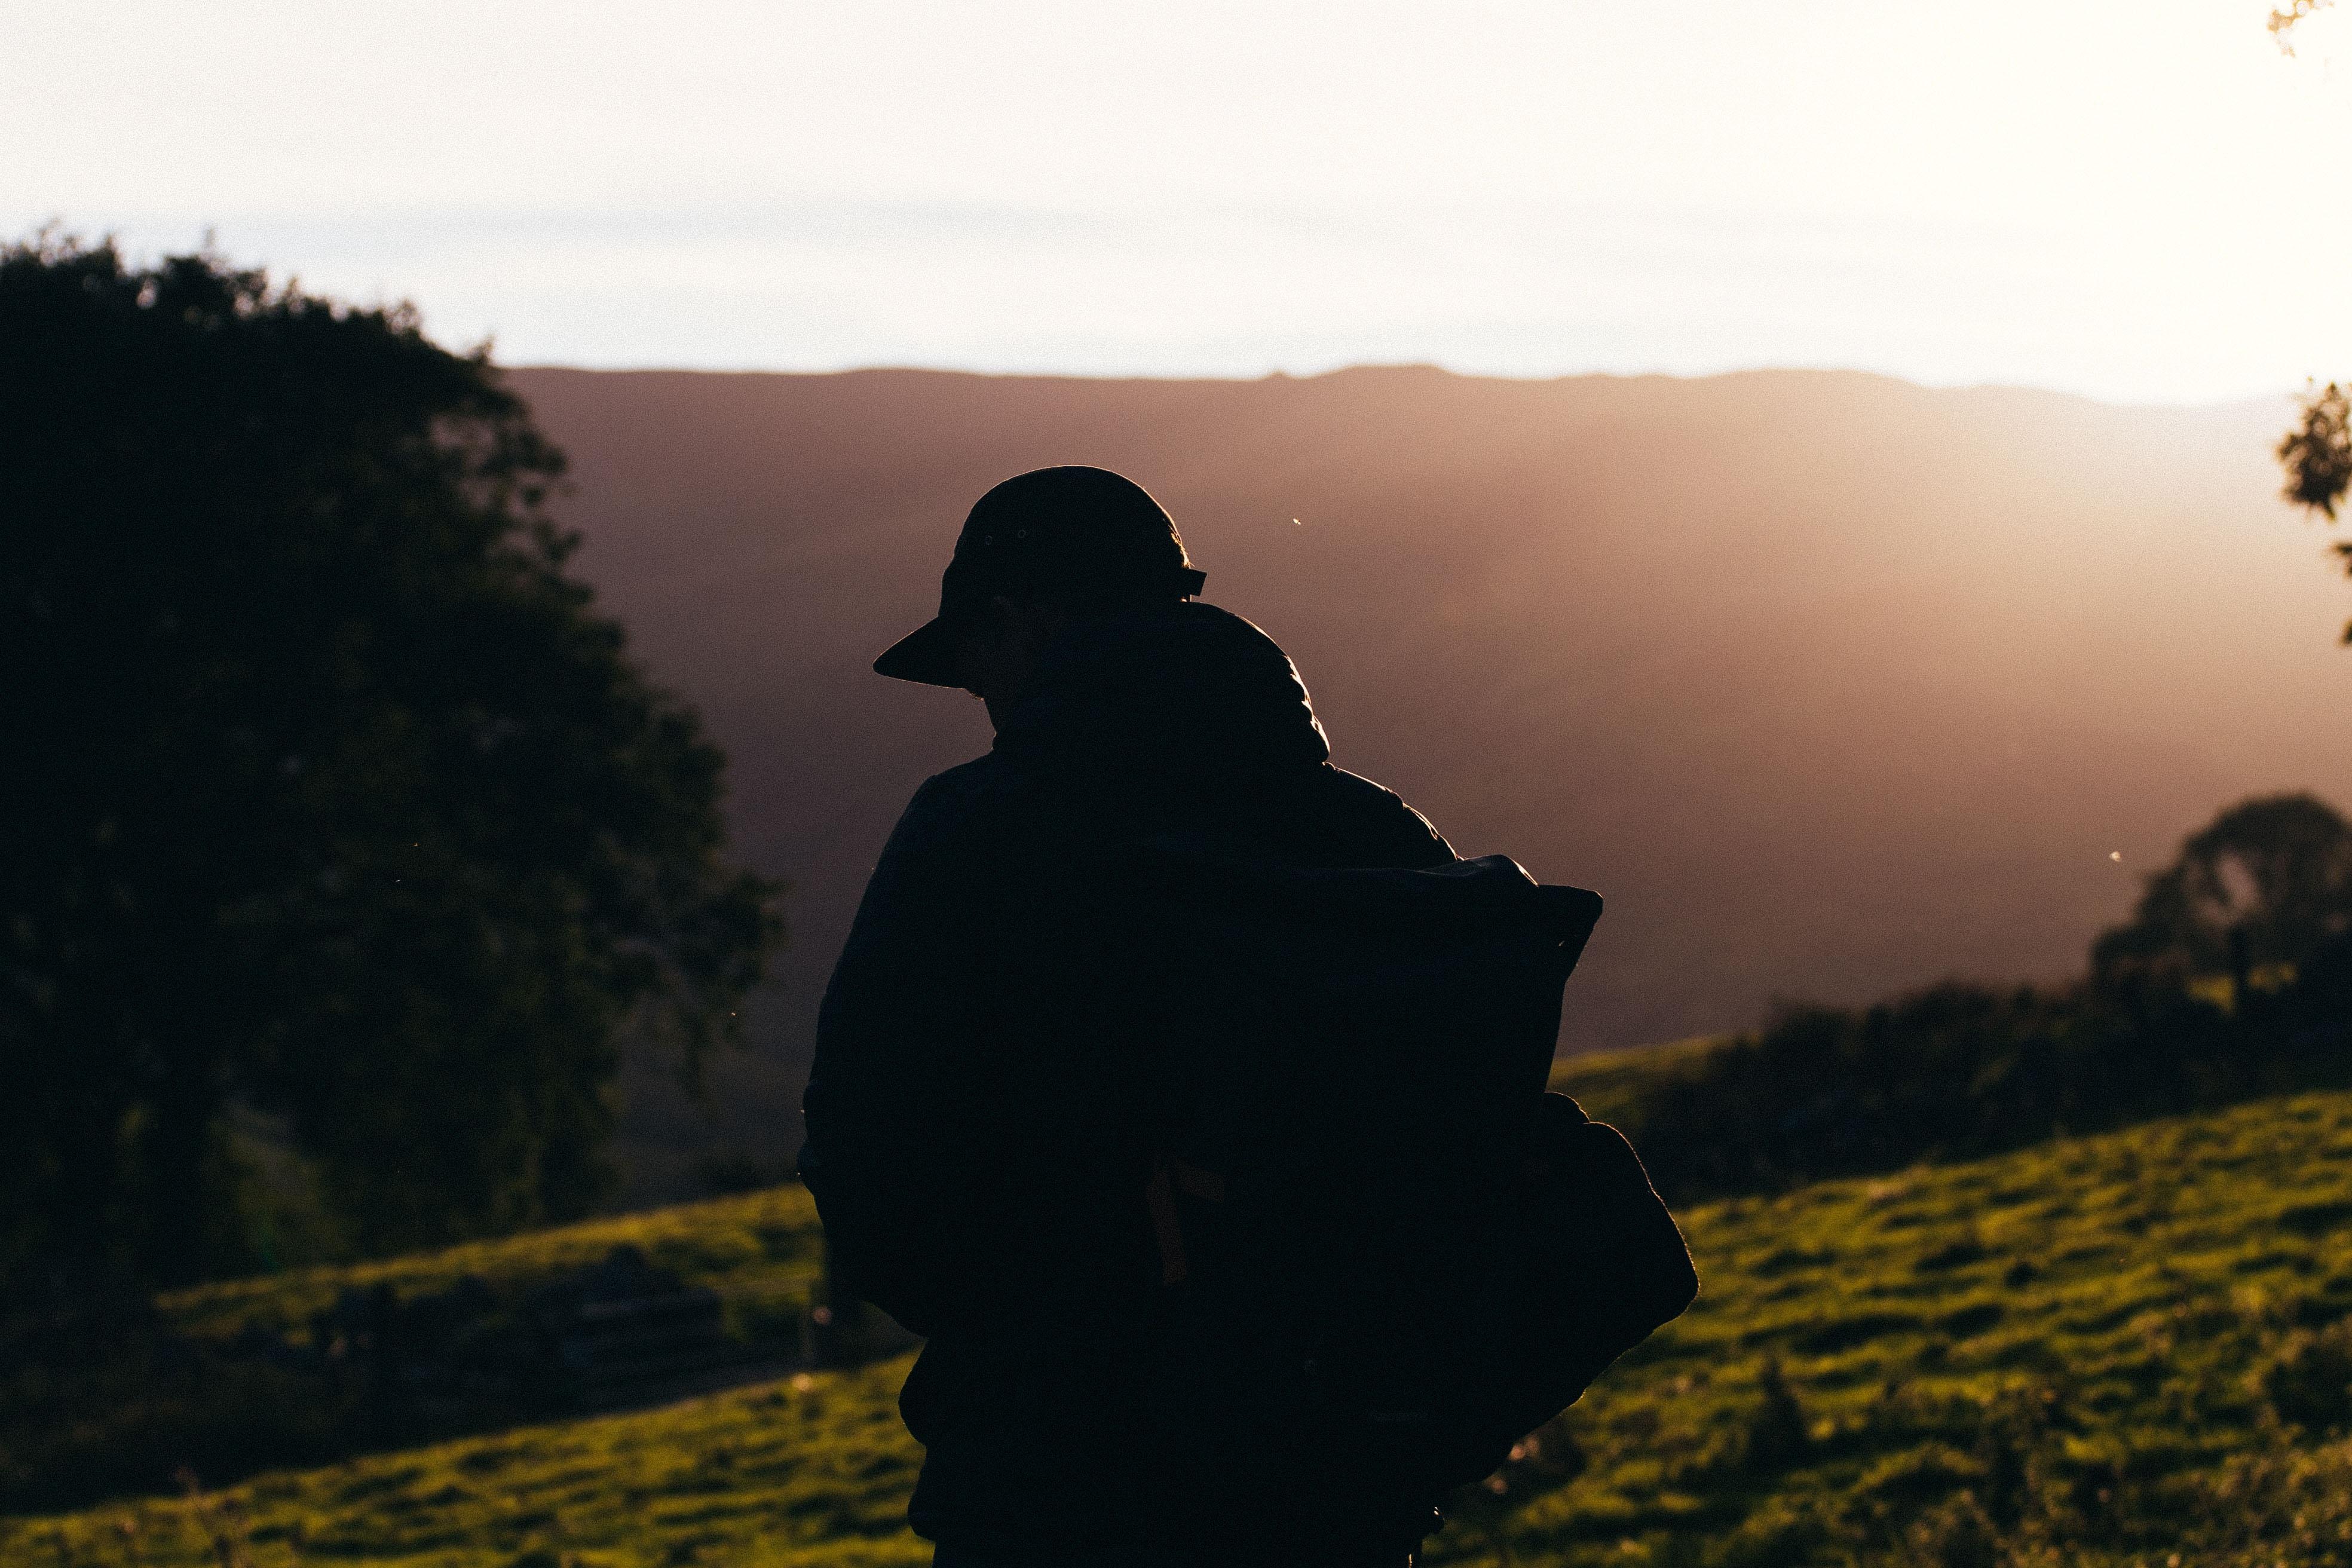 A man hikes through the grass on a mountain in Snowdon